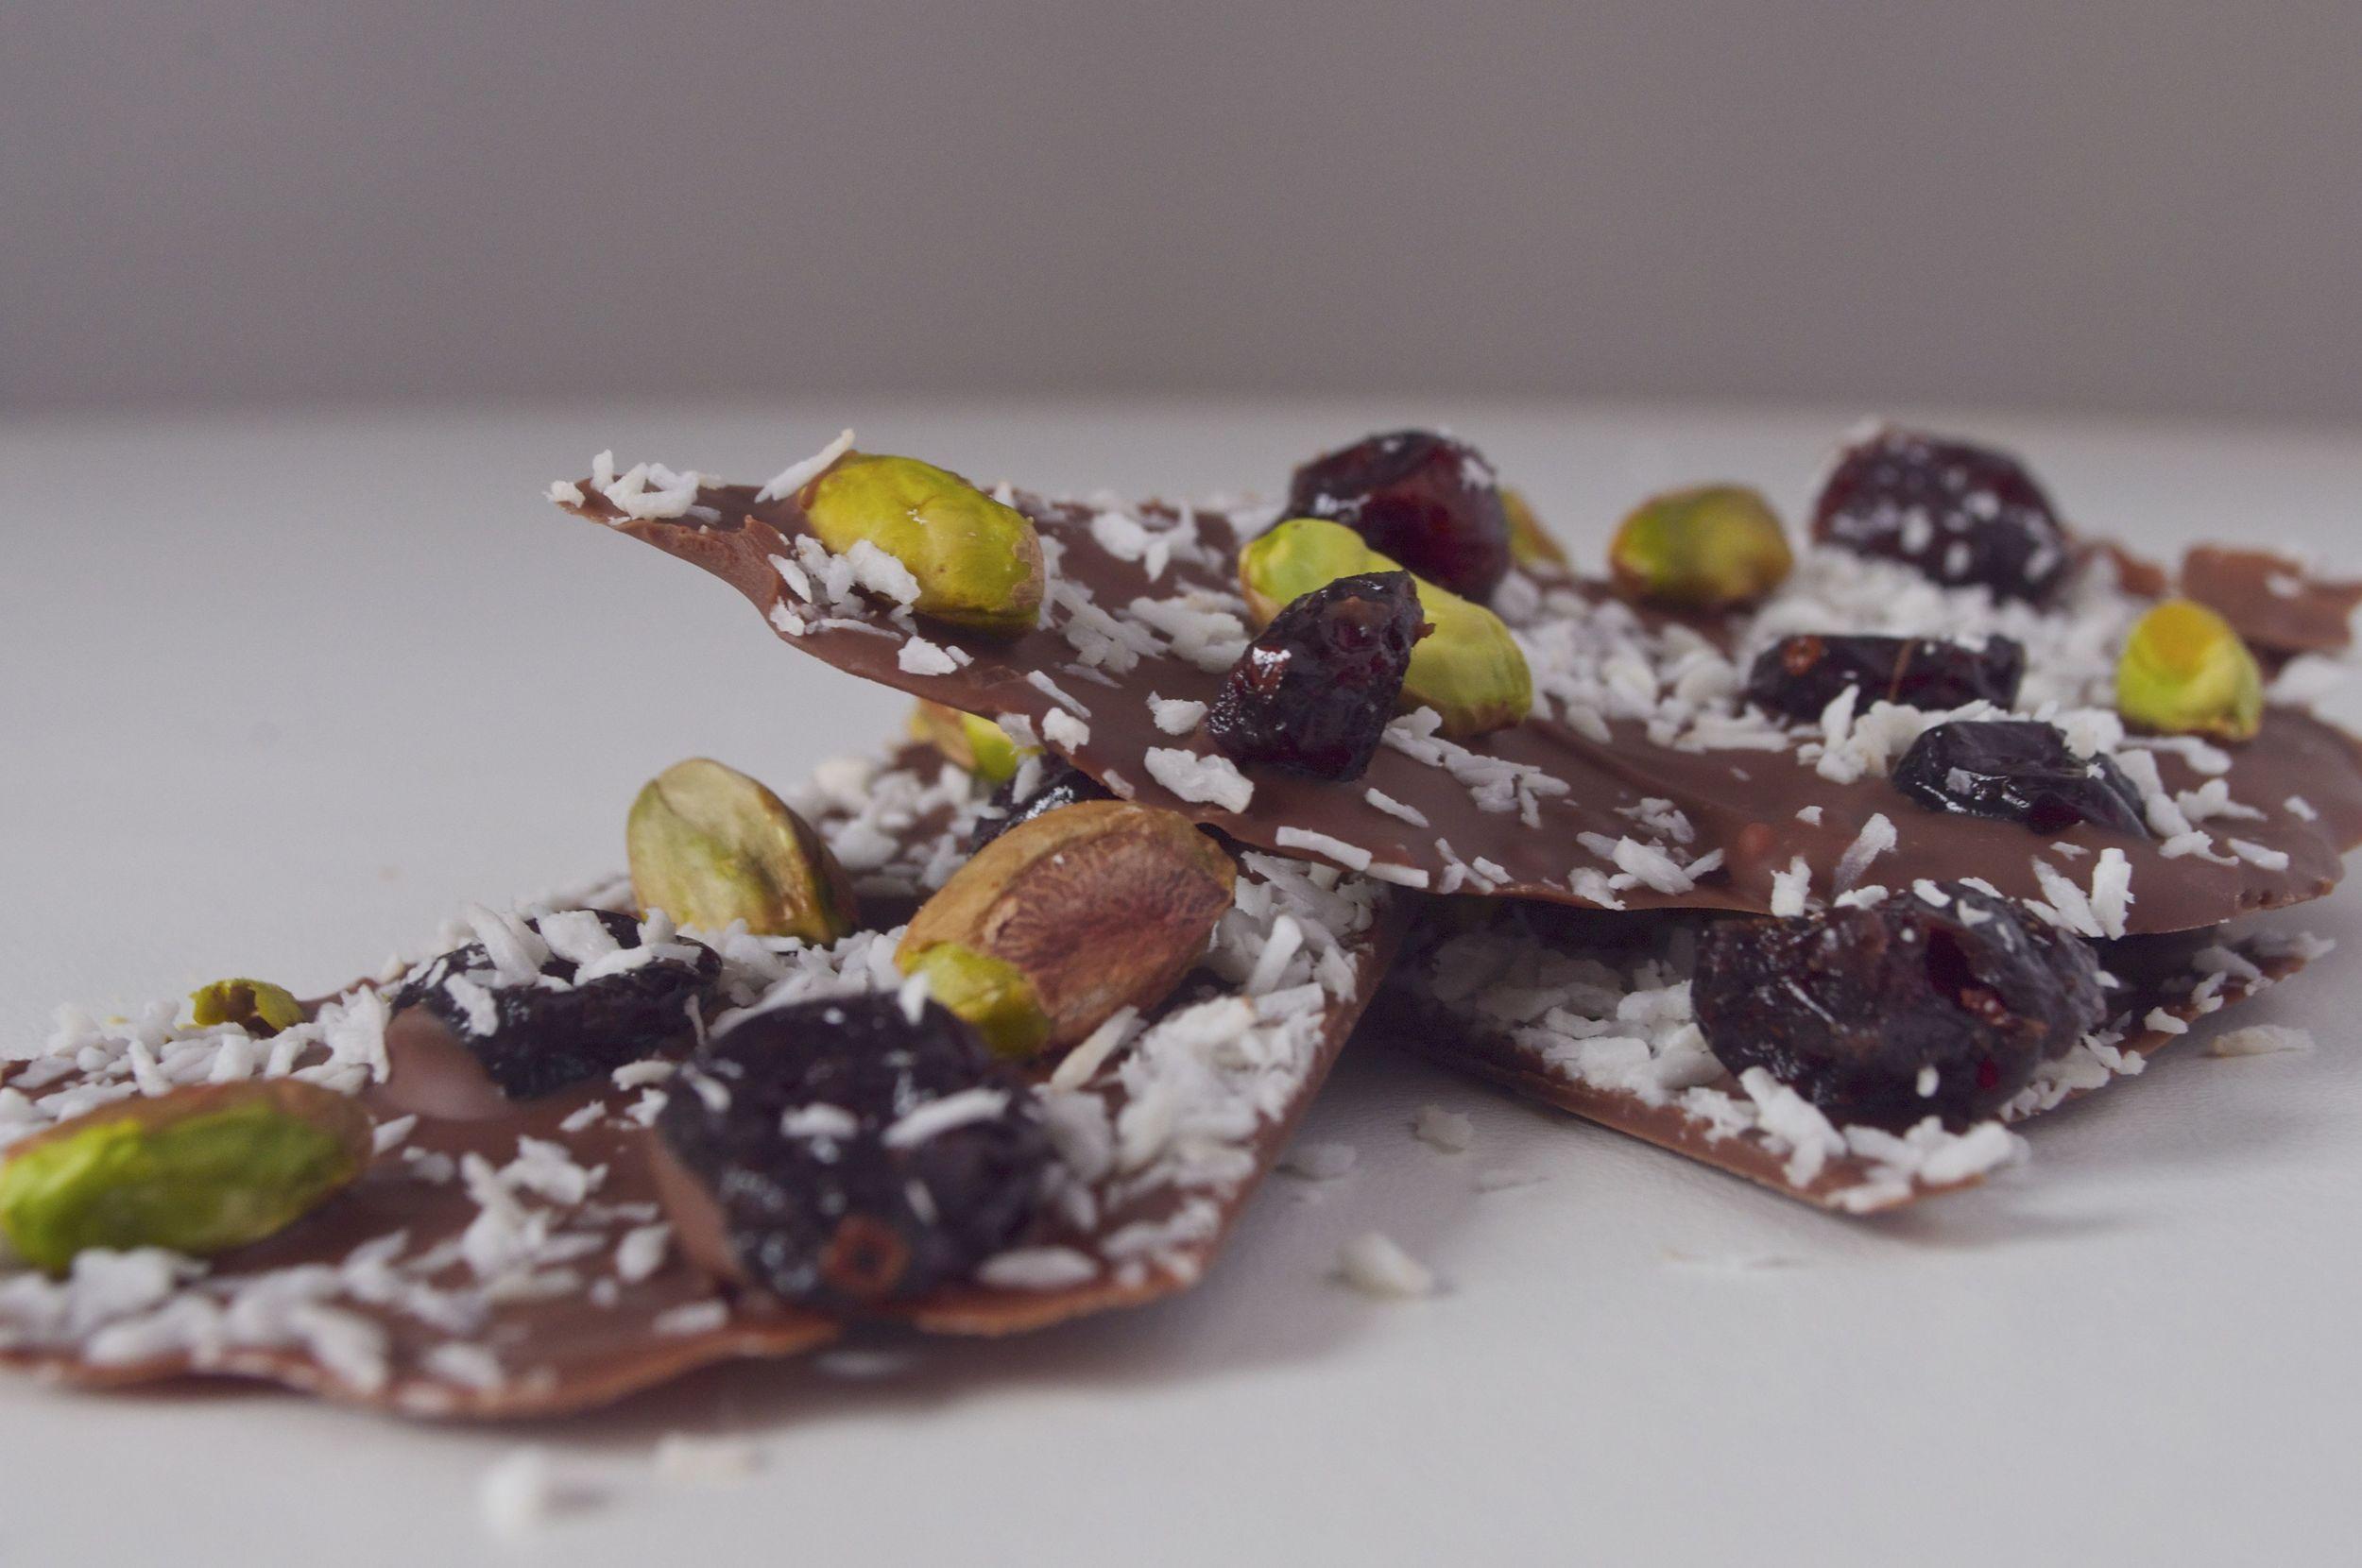 pistachio-cranberry-coconut-chocolate-bark-fried-parsley